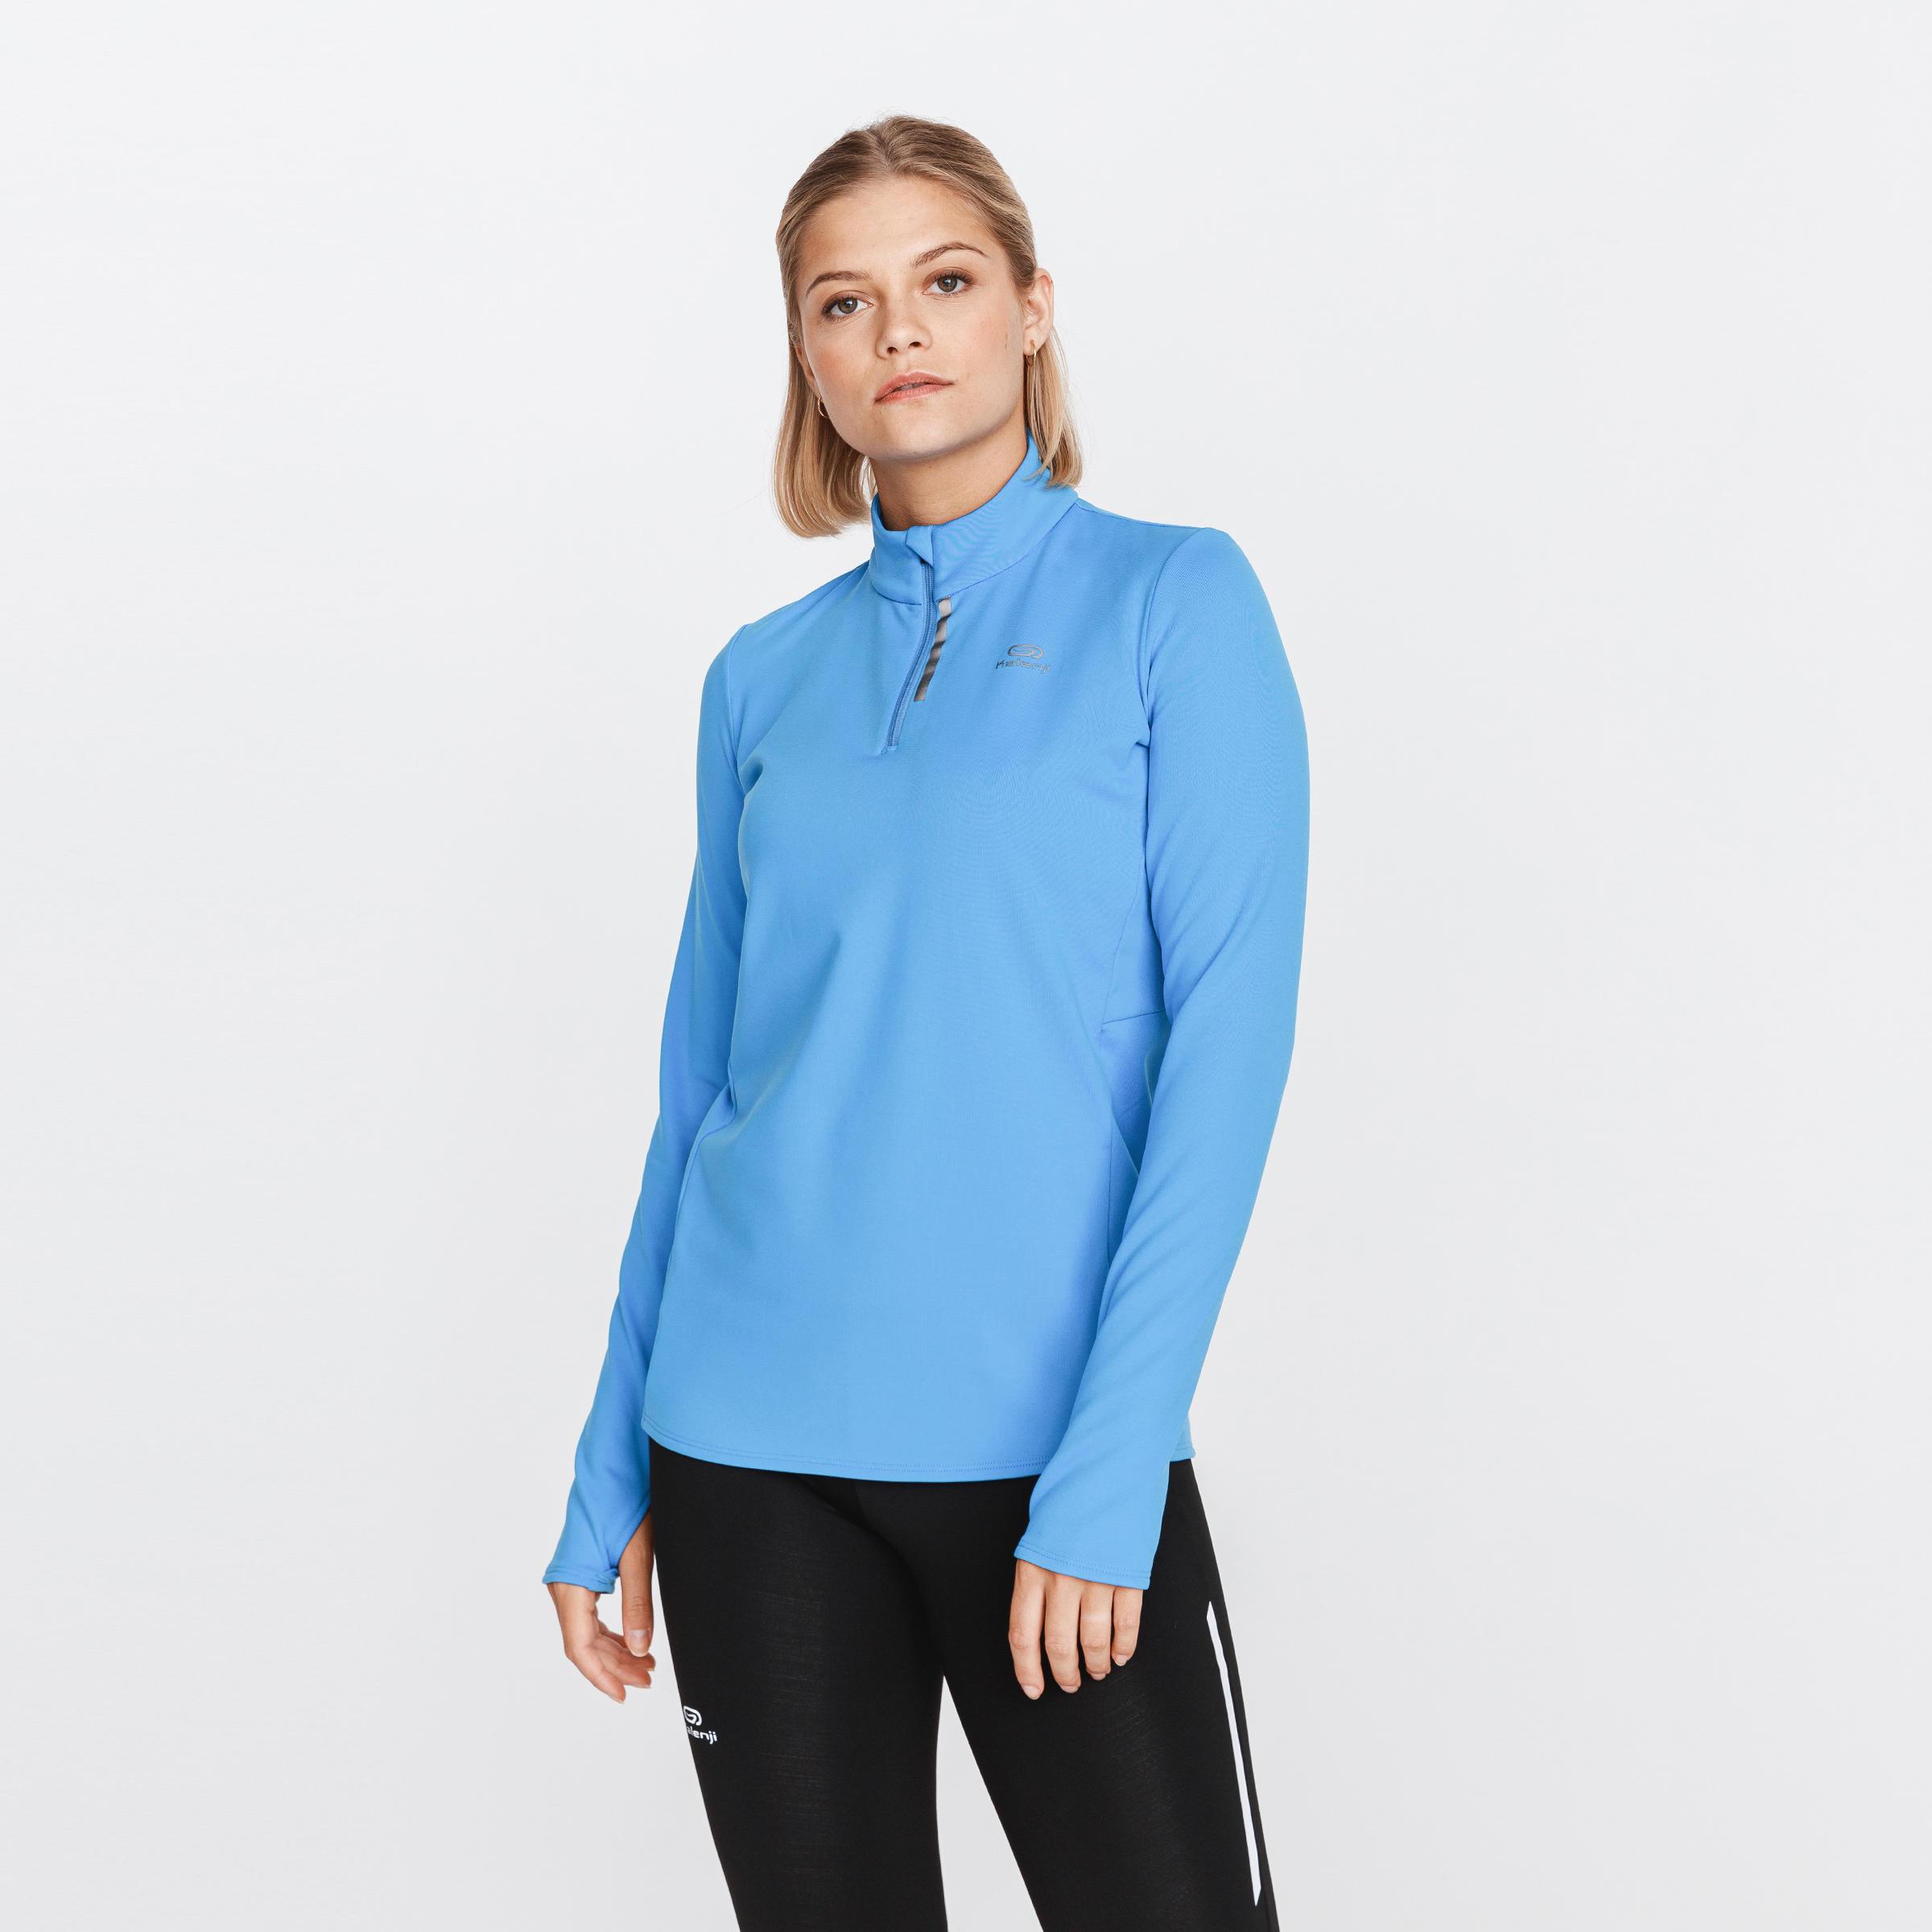 Bluză cu Fermoar RUN WARM la Reducere poza